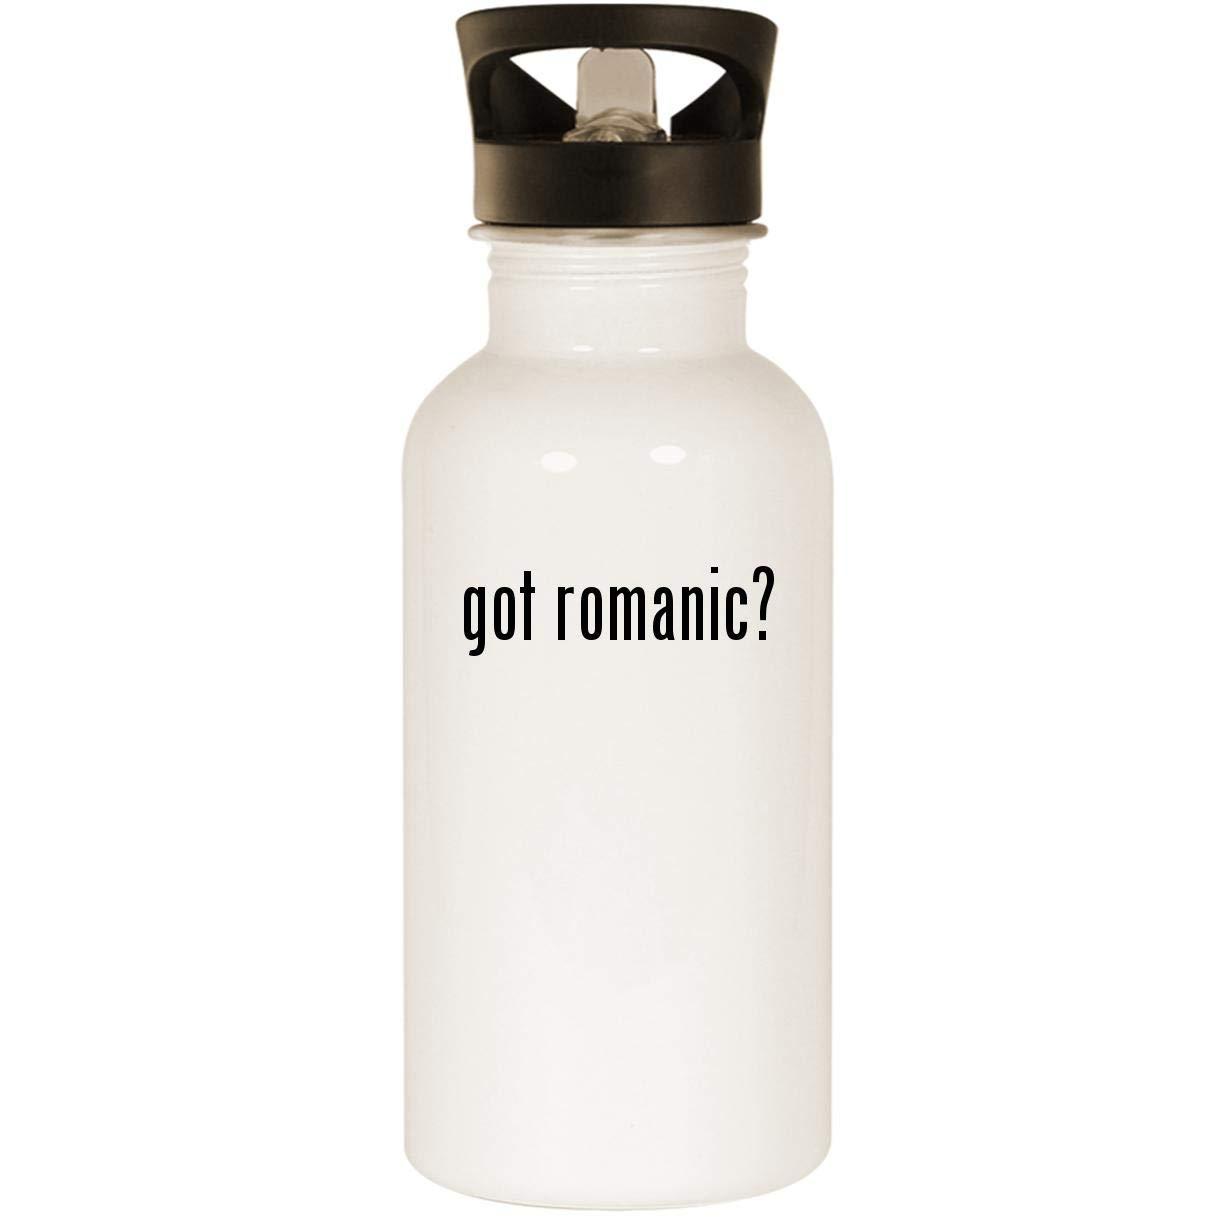 got romanic? - Stainless Steel 20oz Road Ready Water Bottle, White